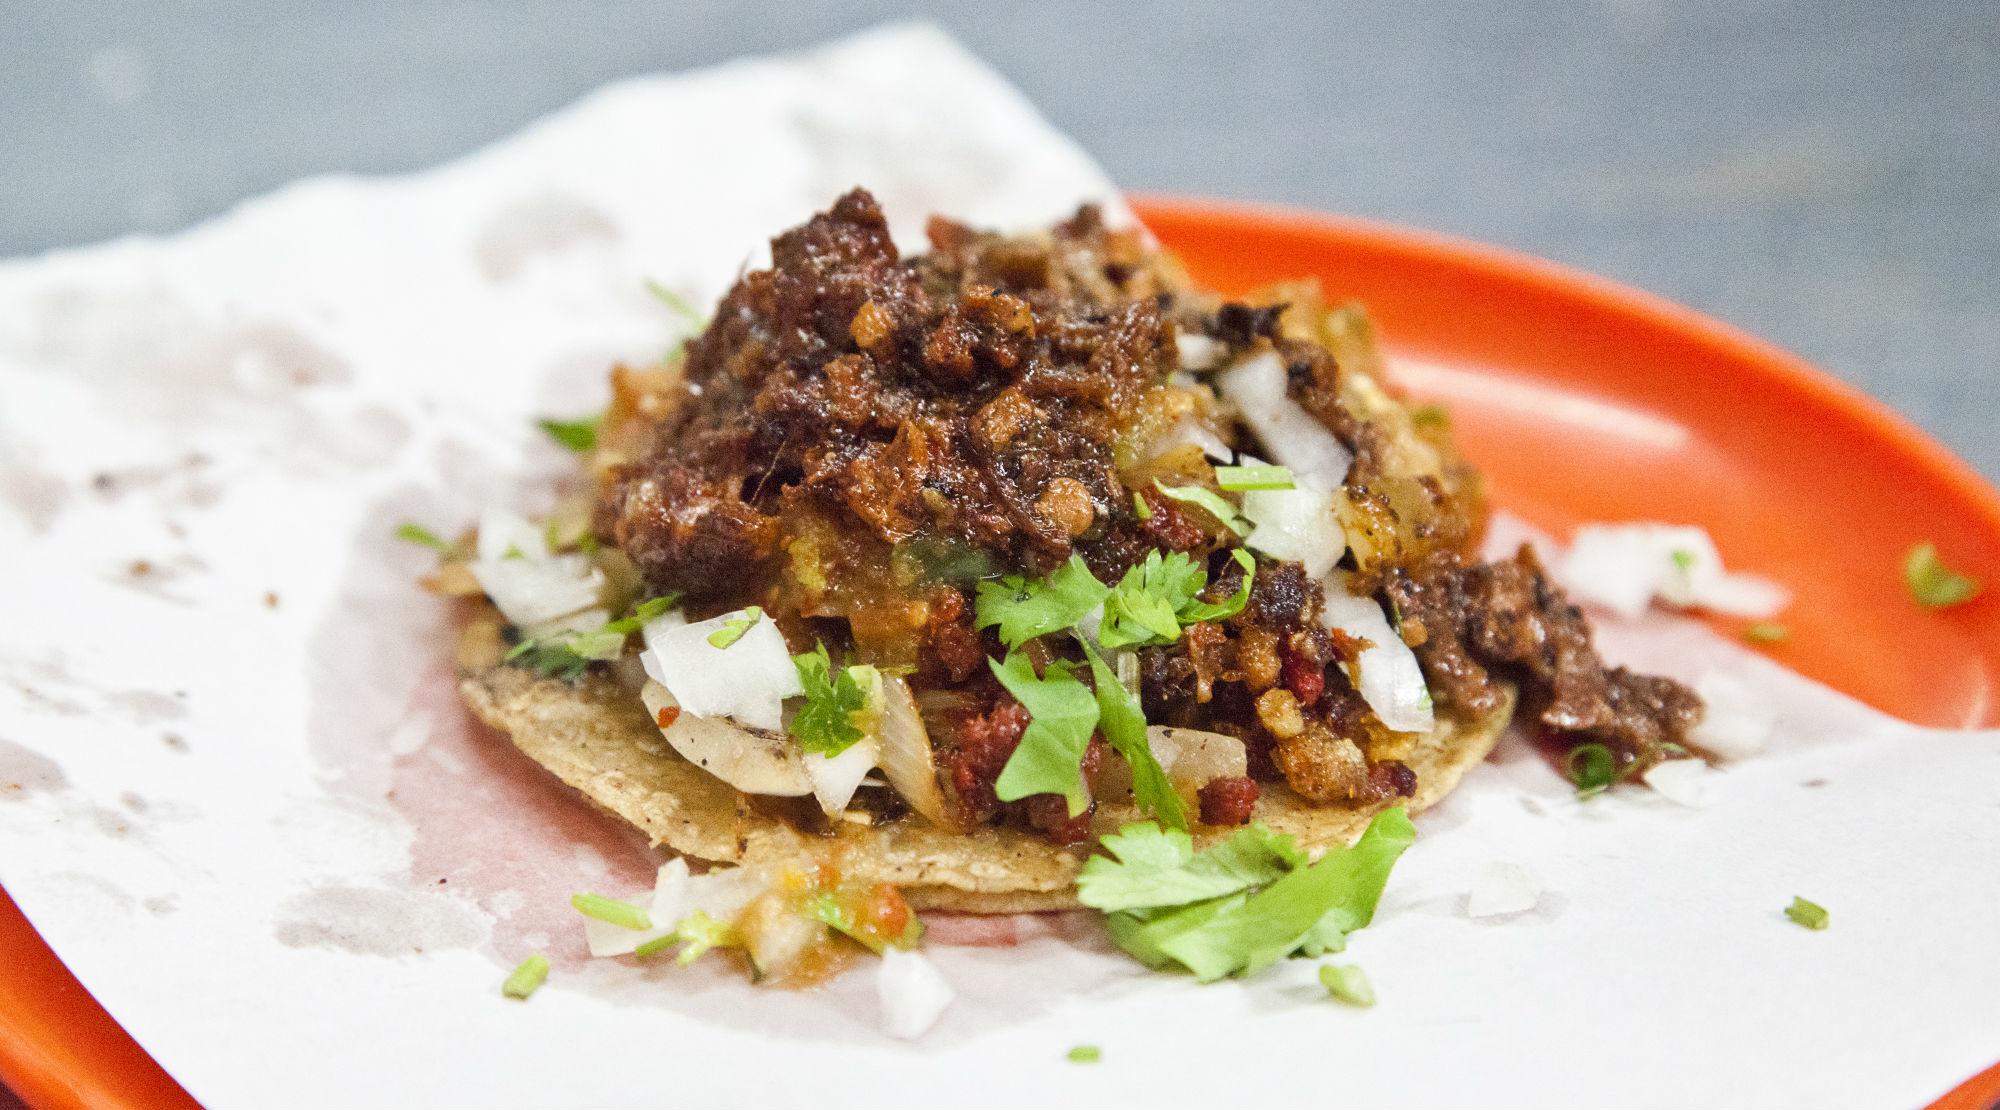 Tacos de cochinada - Tacos Beto